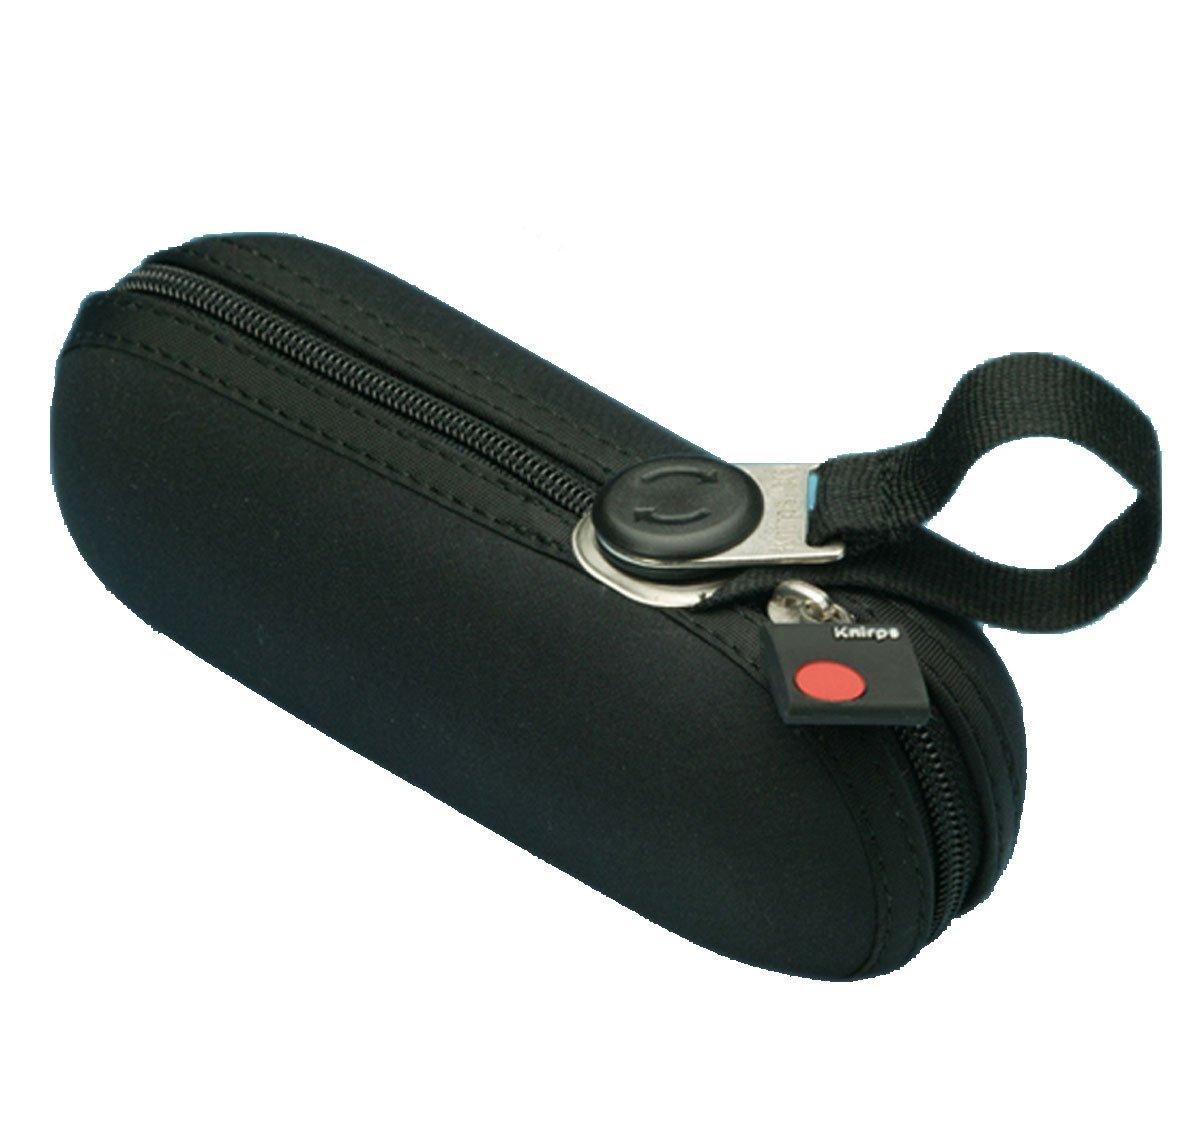 Knirps X1 - Paraguas plegable, color negro [Importado de Alemania] 106906-S